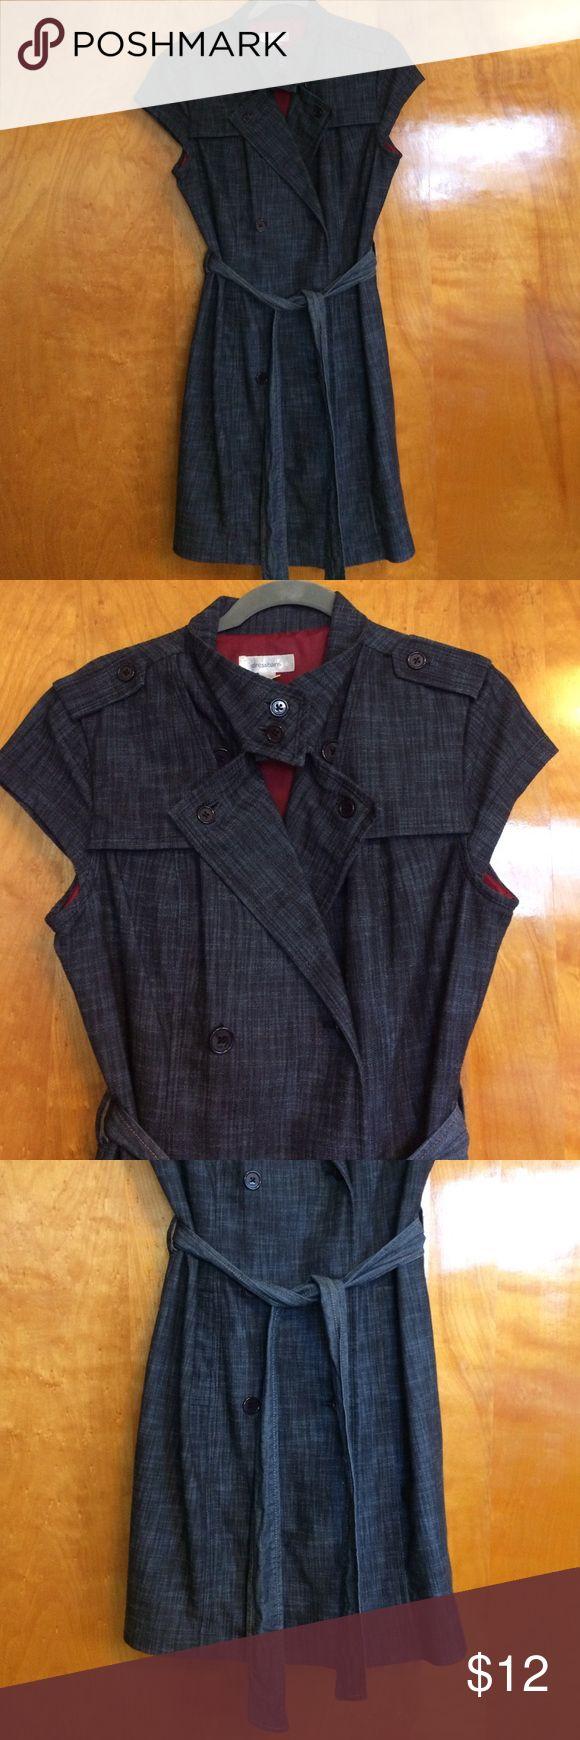 Work jean dress Versatile denim dress. Front pockets, slit on bottom back for comfort and fully lined. Dress Barn Dresses Midi